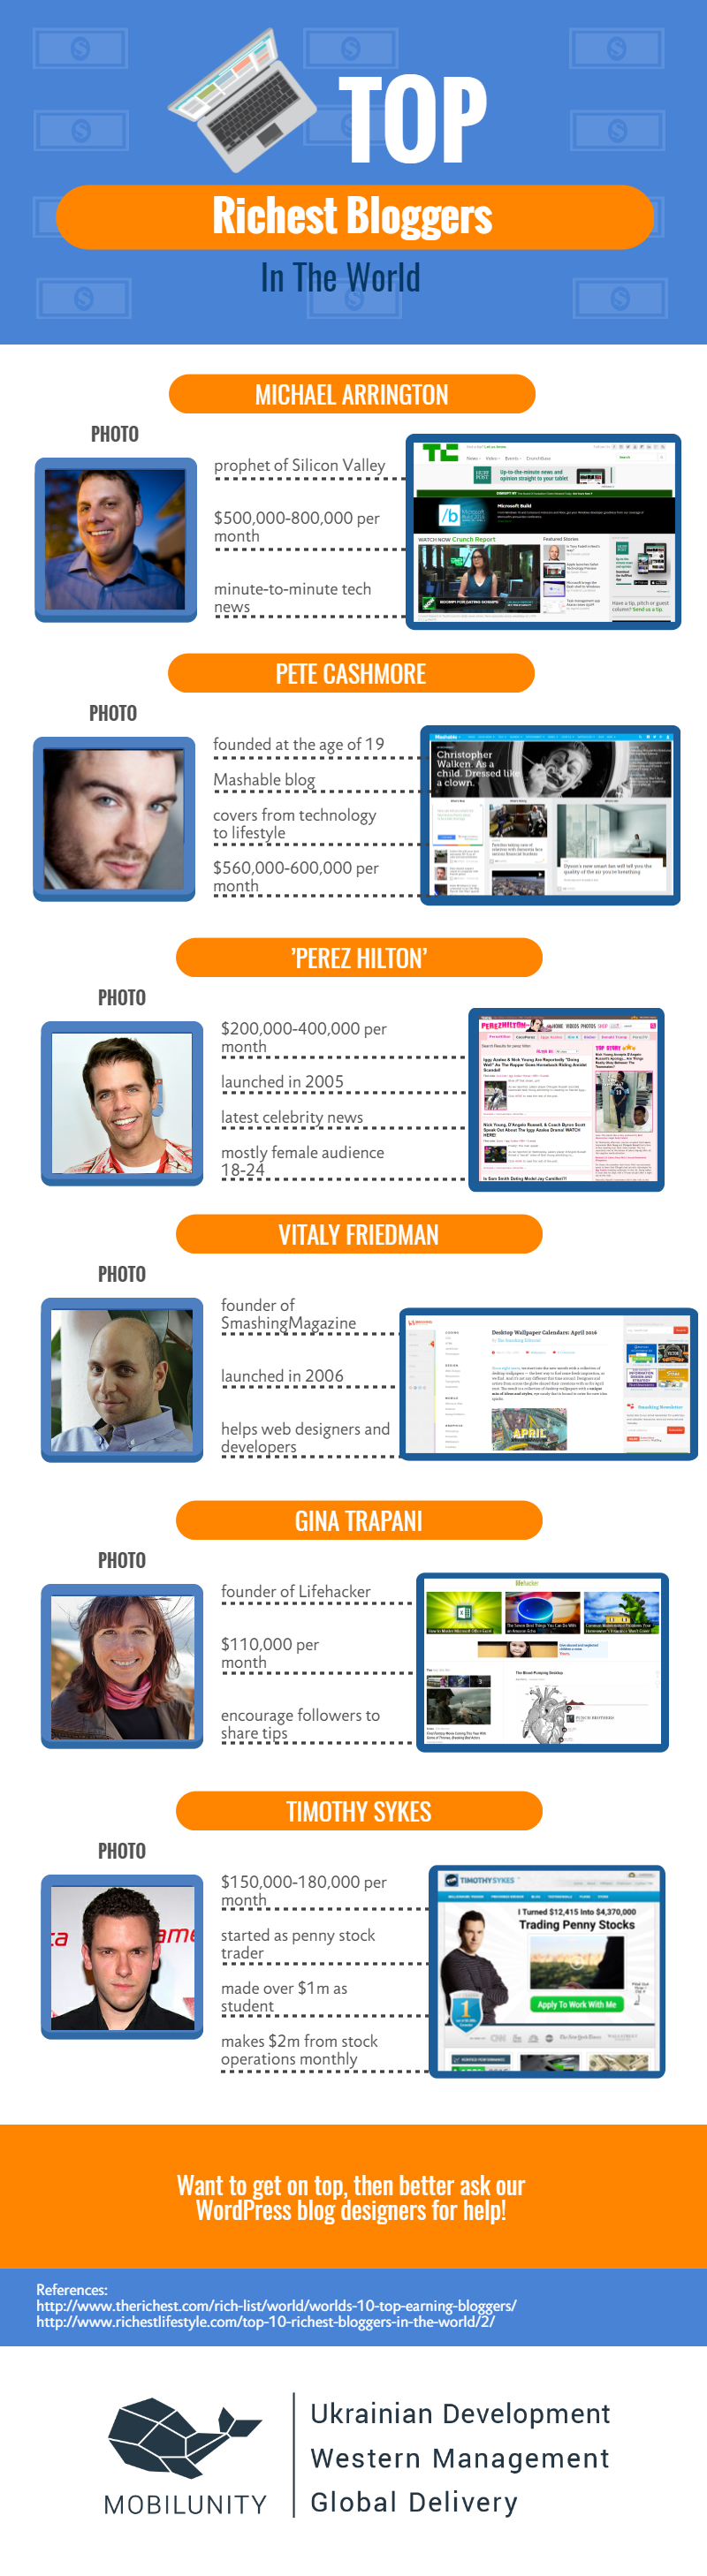 wordpress blog designers